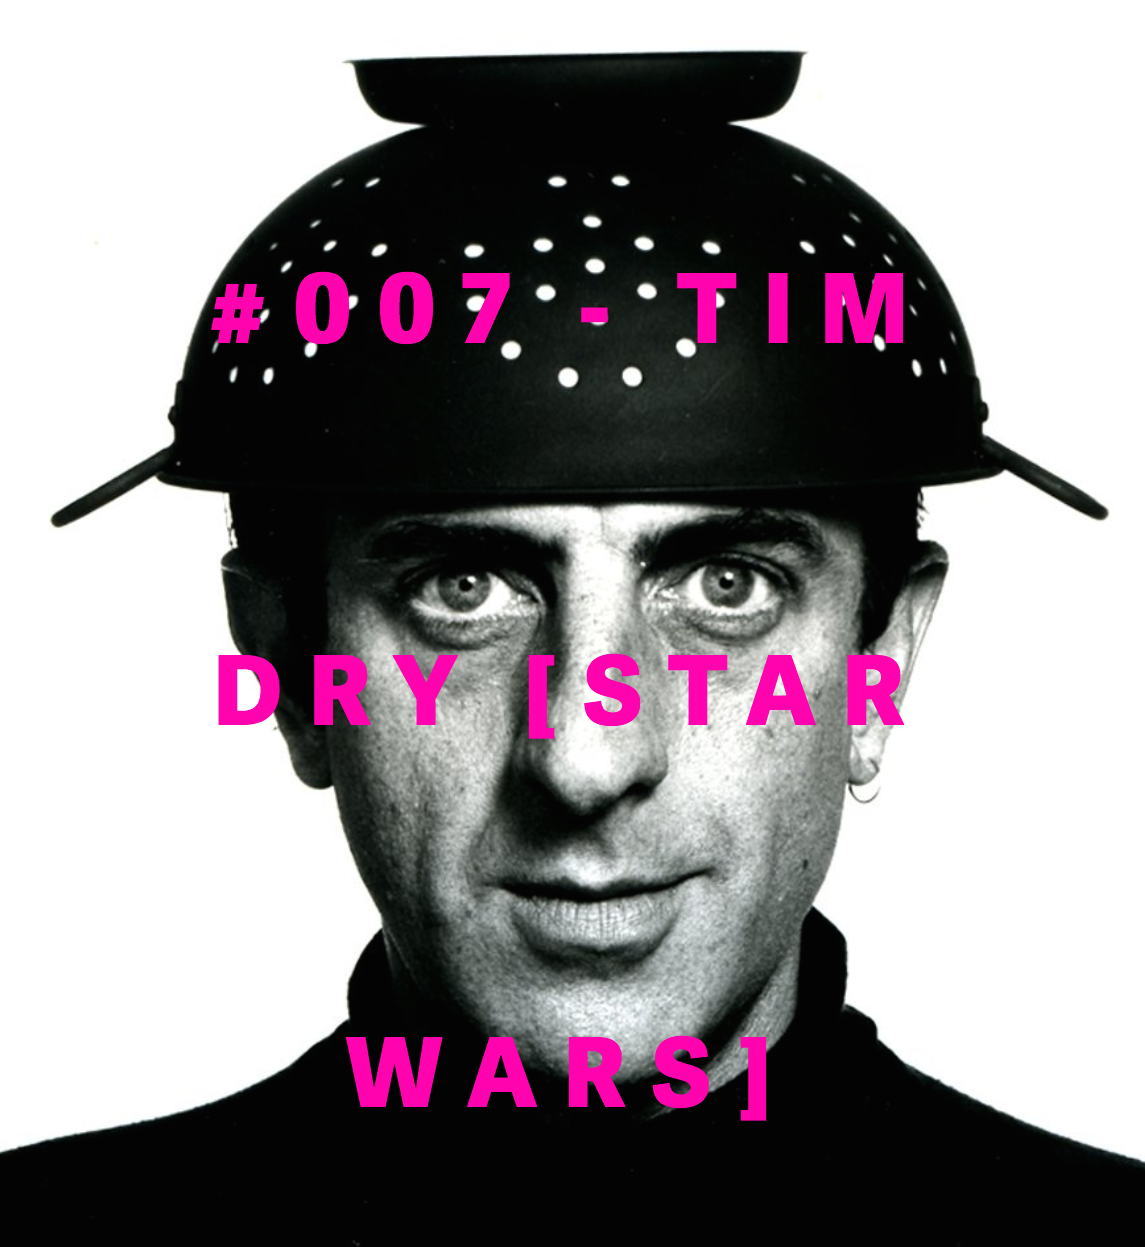 TIM DRY  #007-STAR WARS/X-TRO